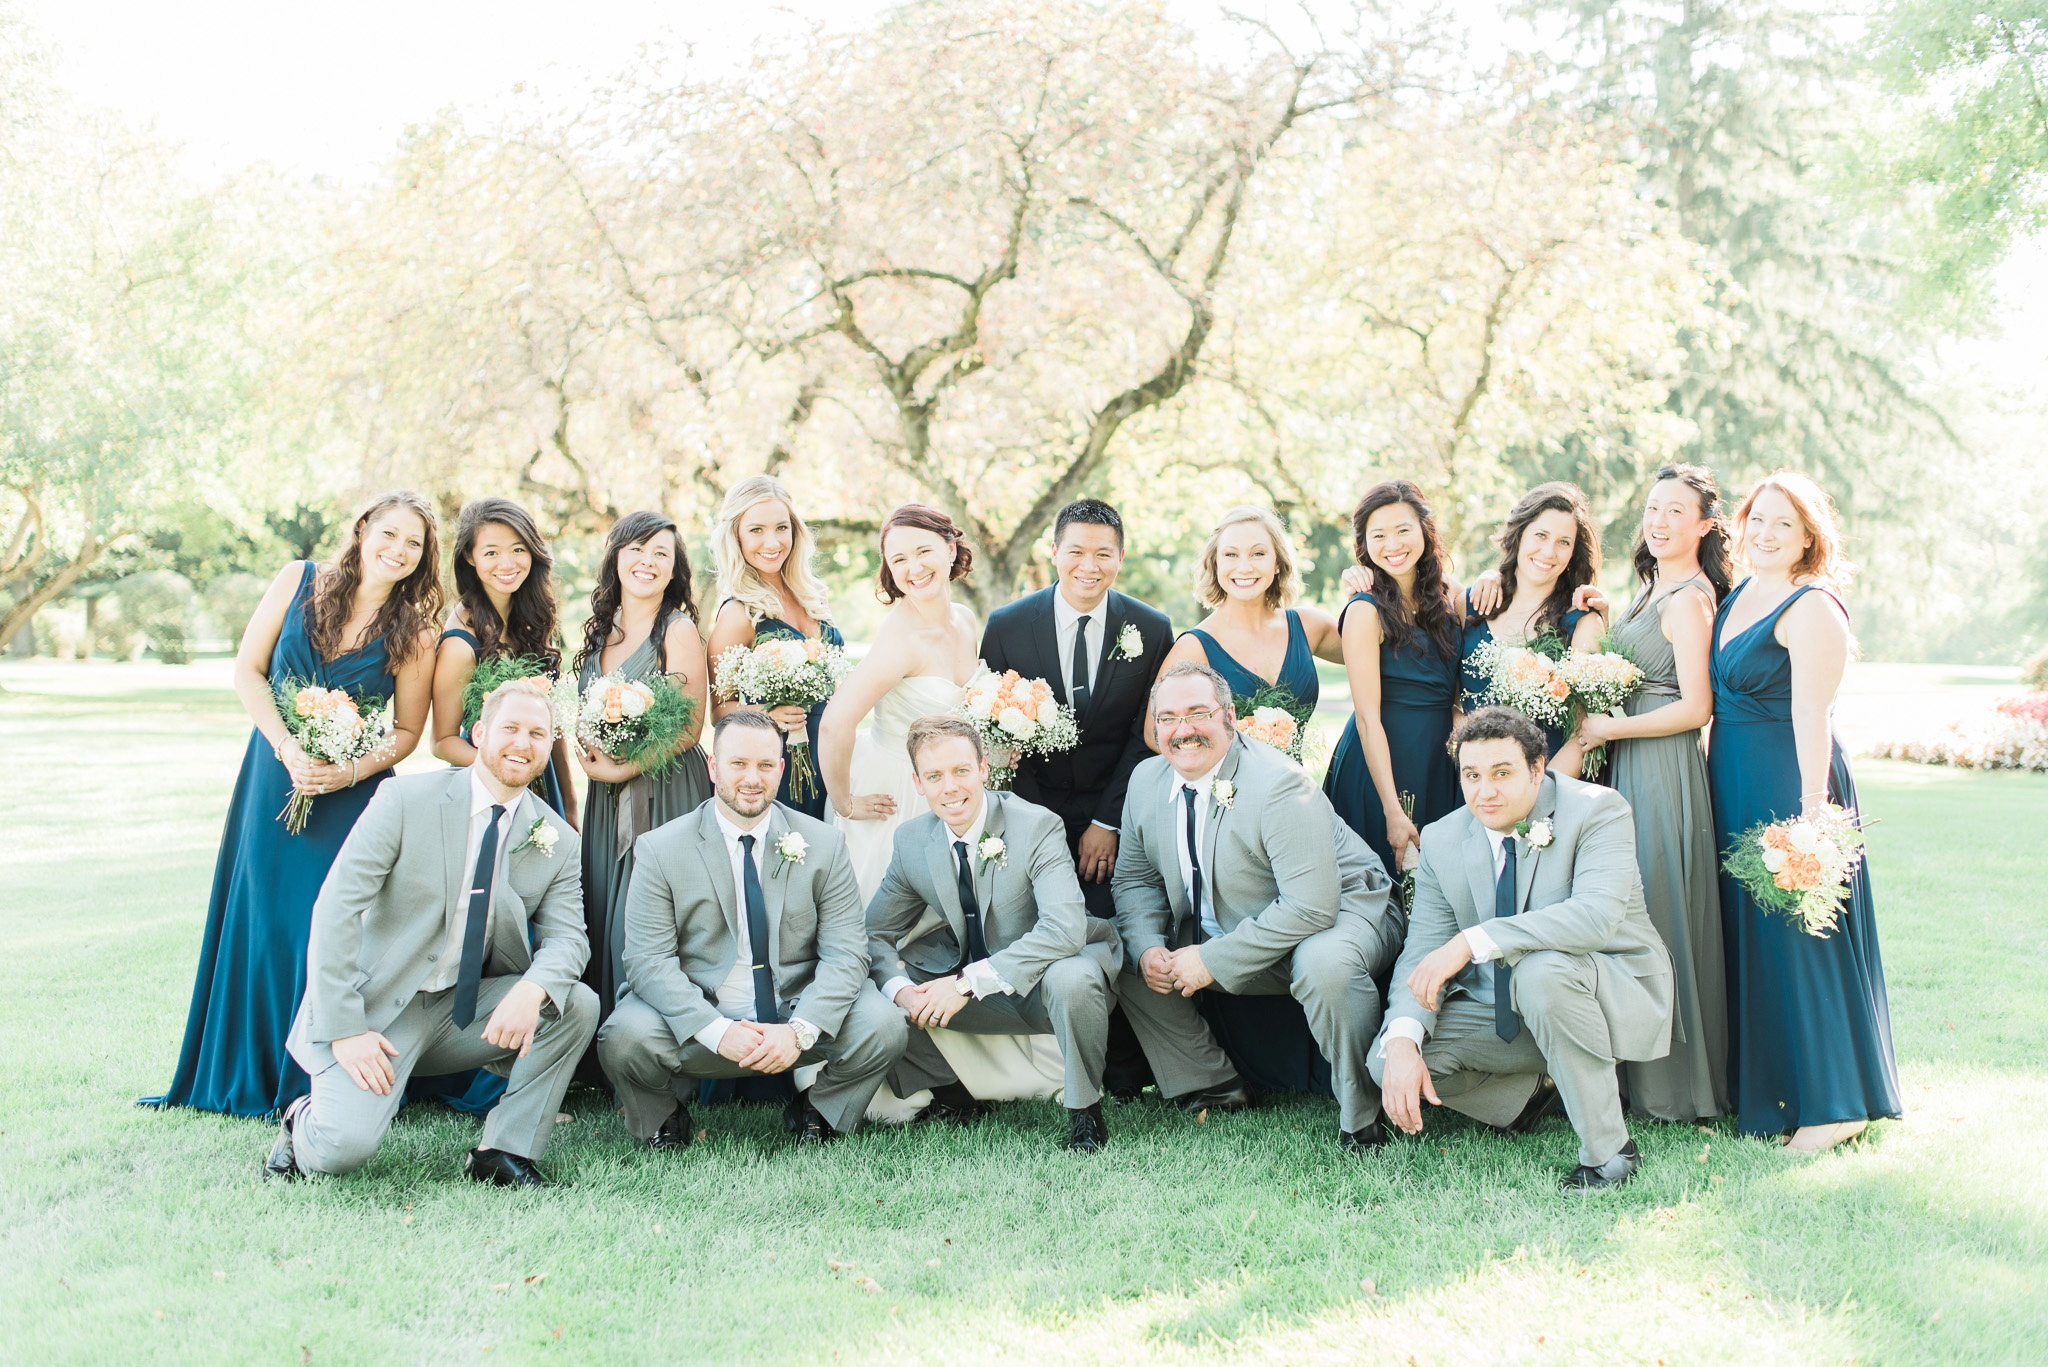 brookside-golf-country-club-wedding-columbus-ohio-78.jpg